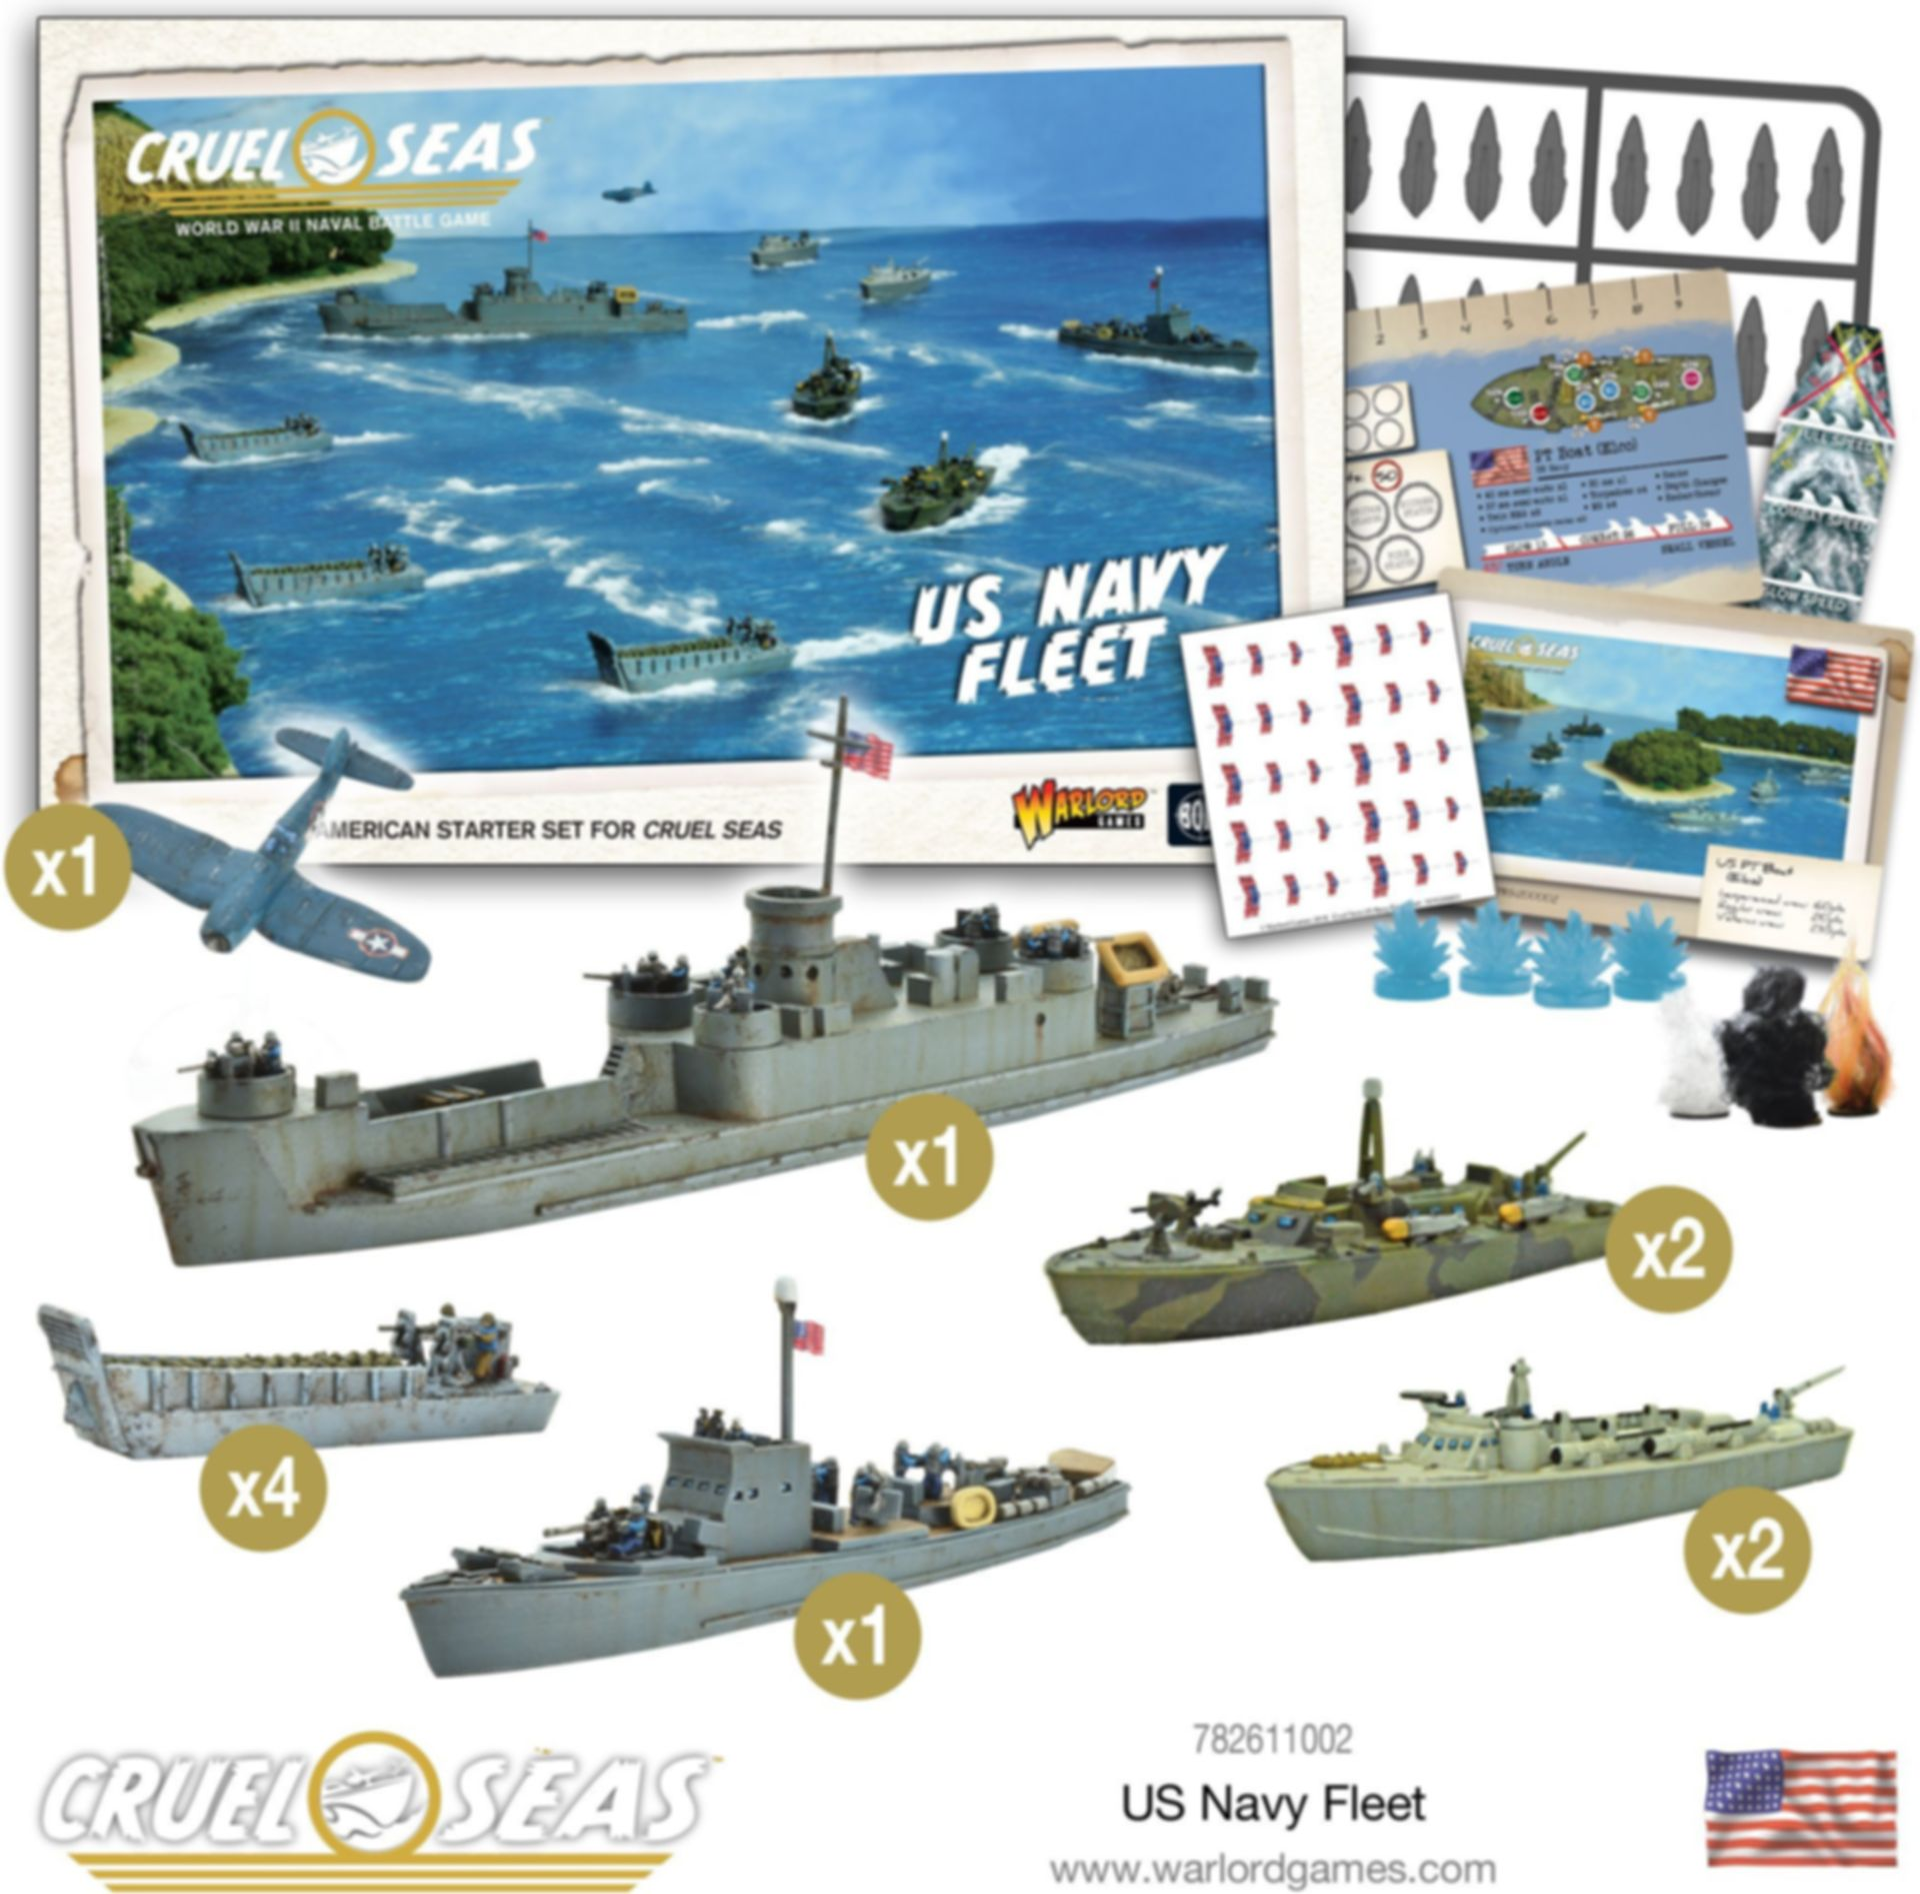 Cruel Seas: US Navy Fleet components